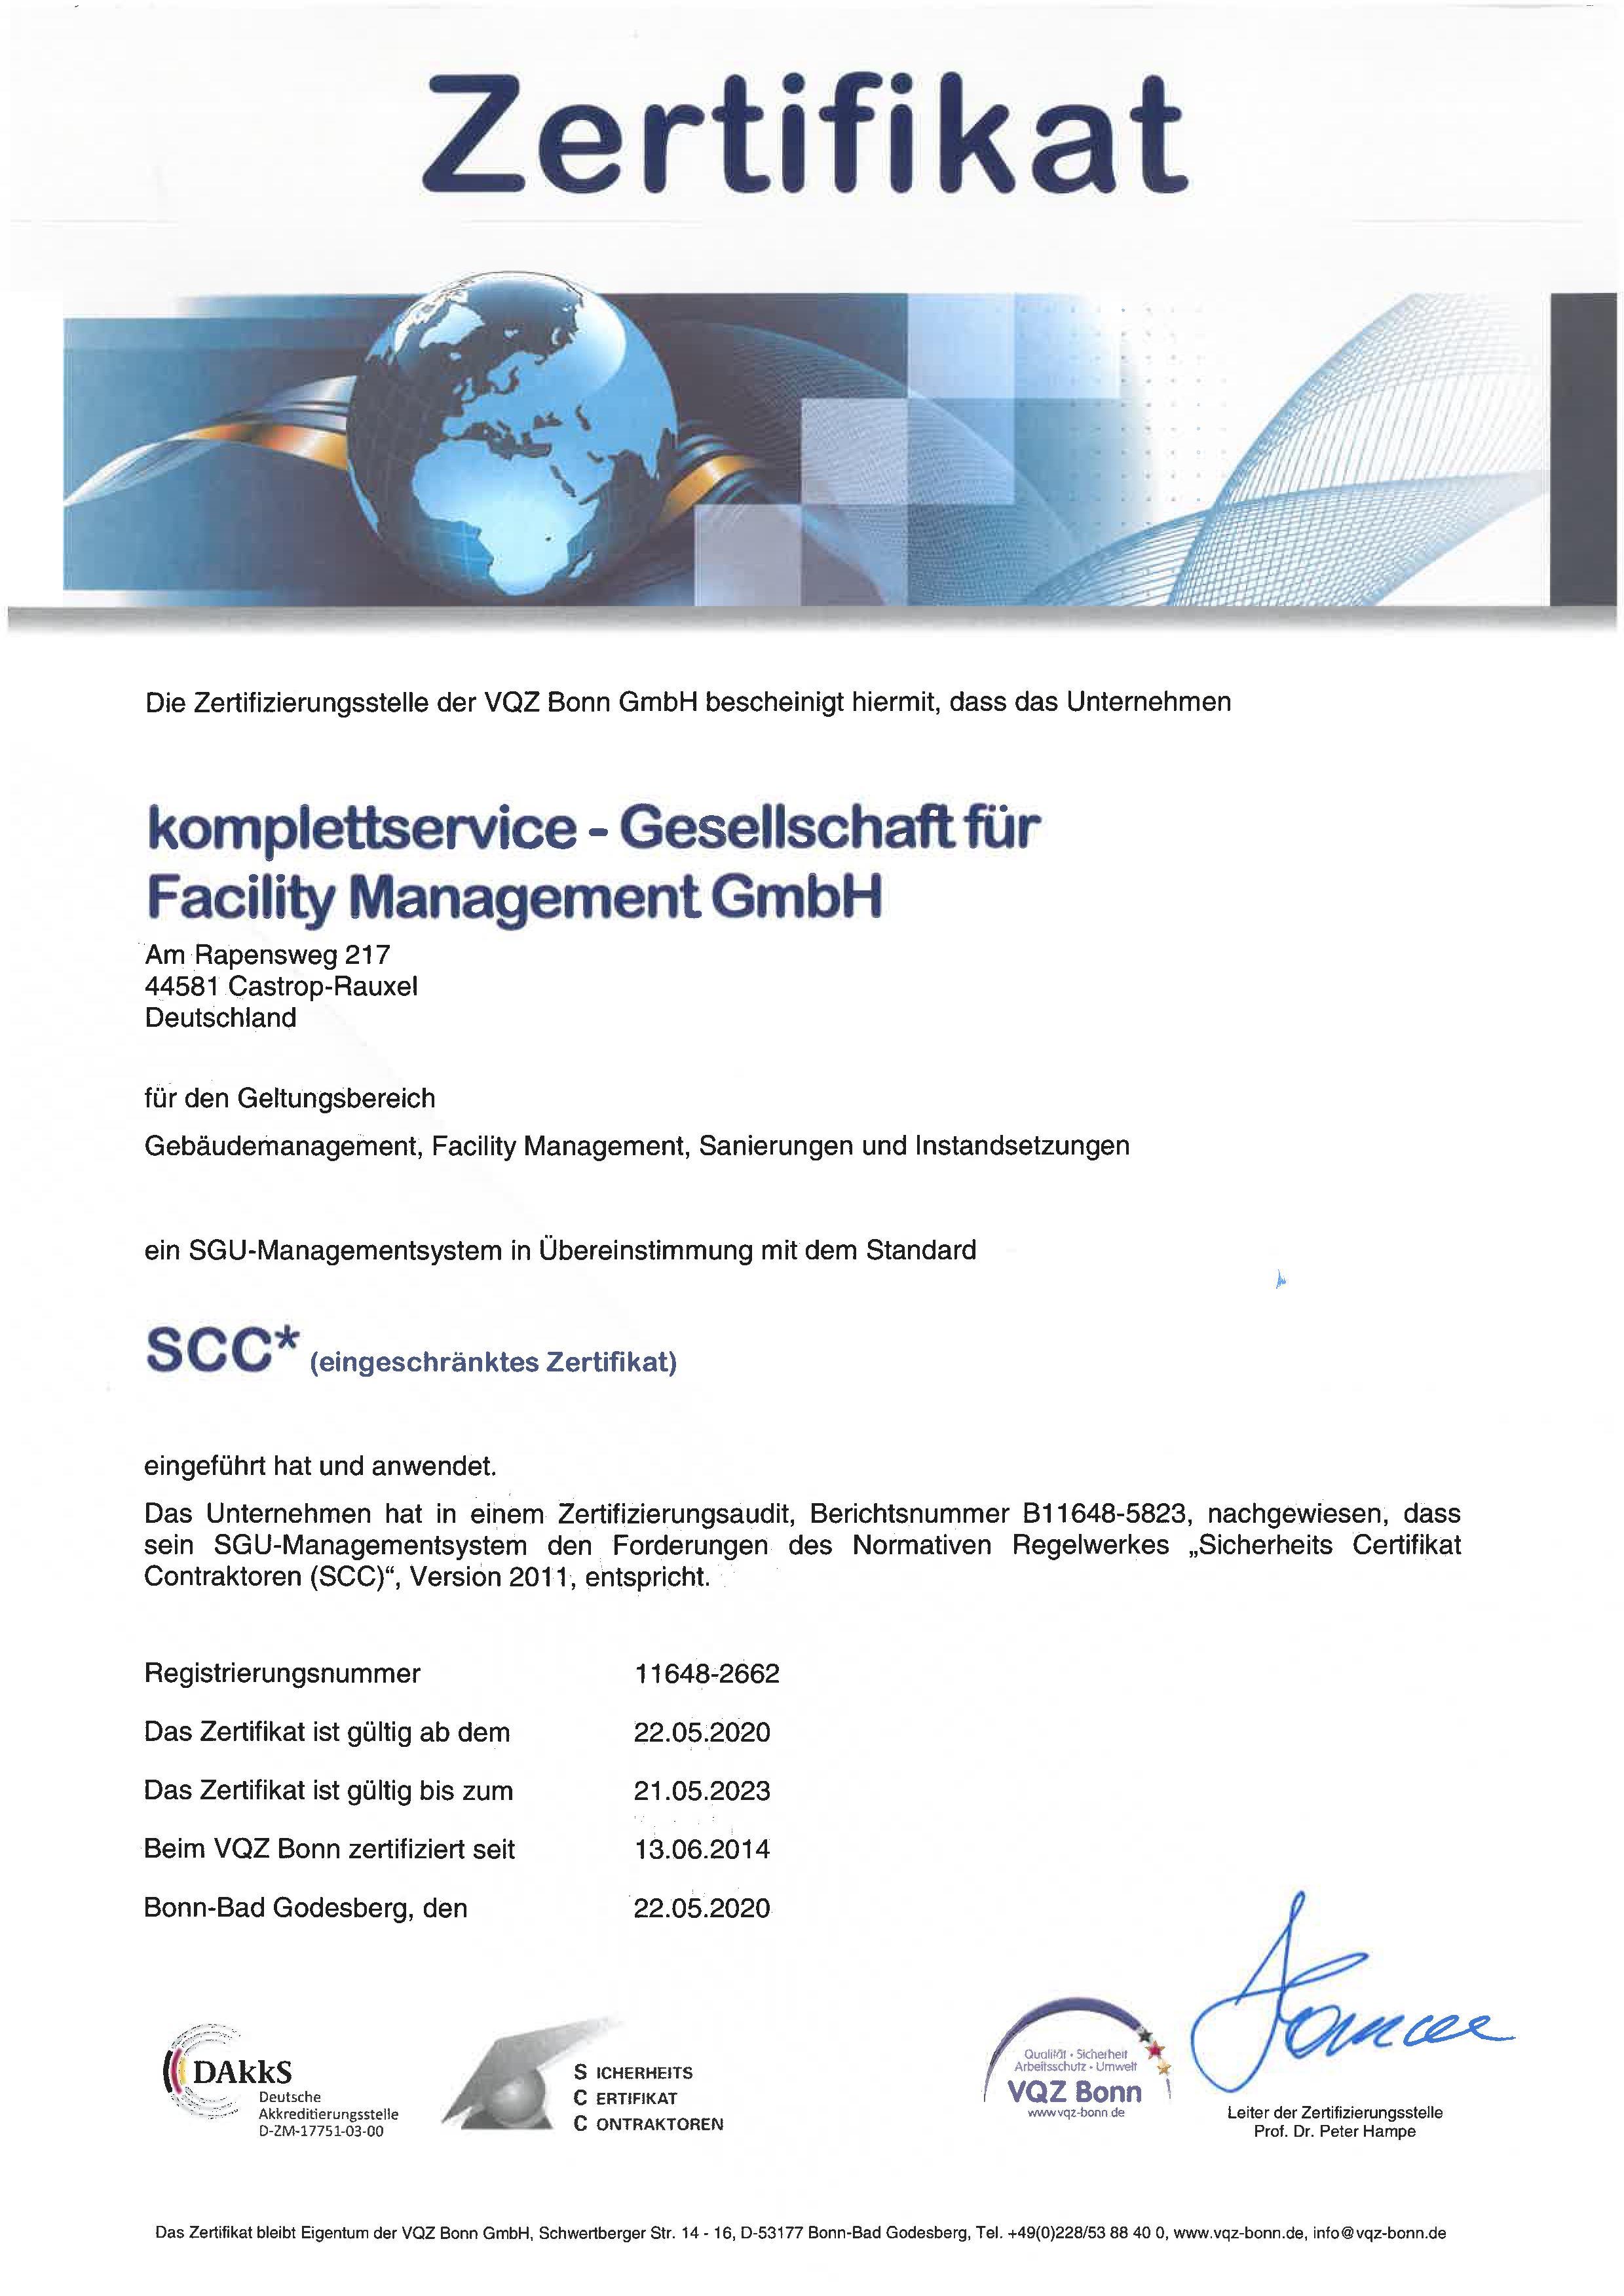 SSC Zertifikat komplettservice